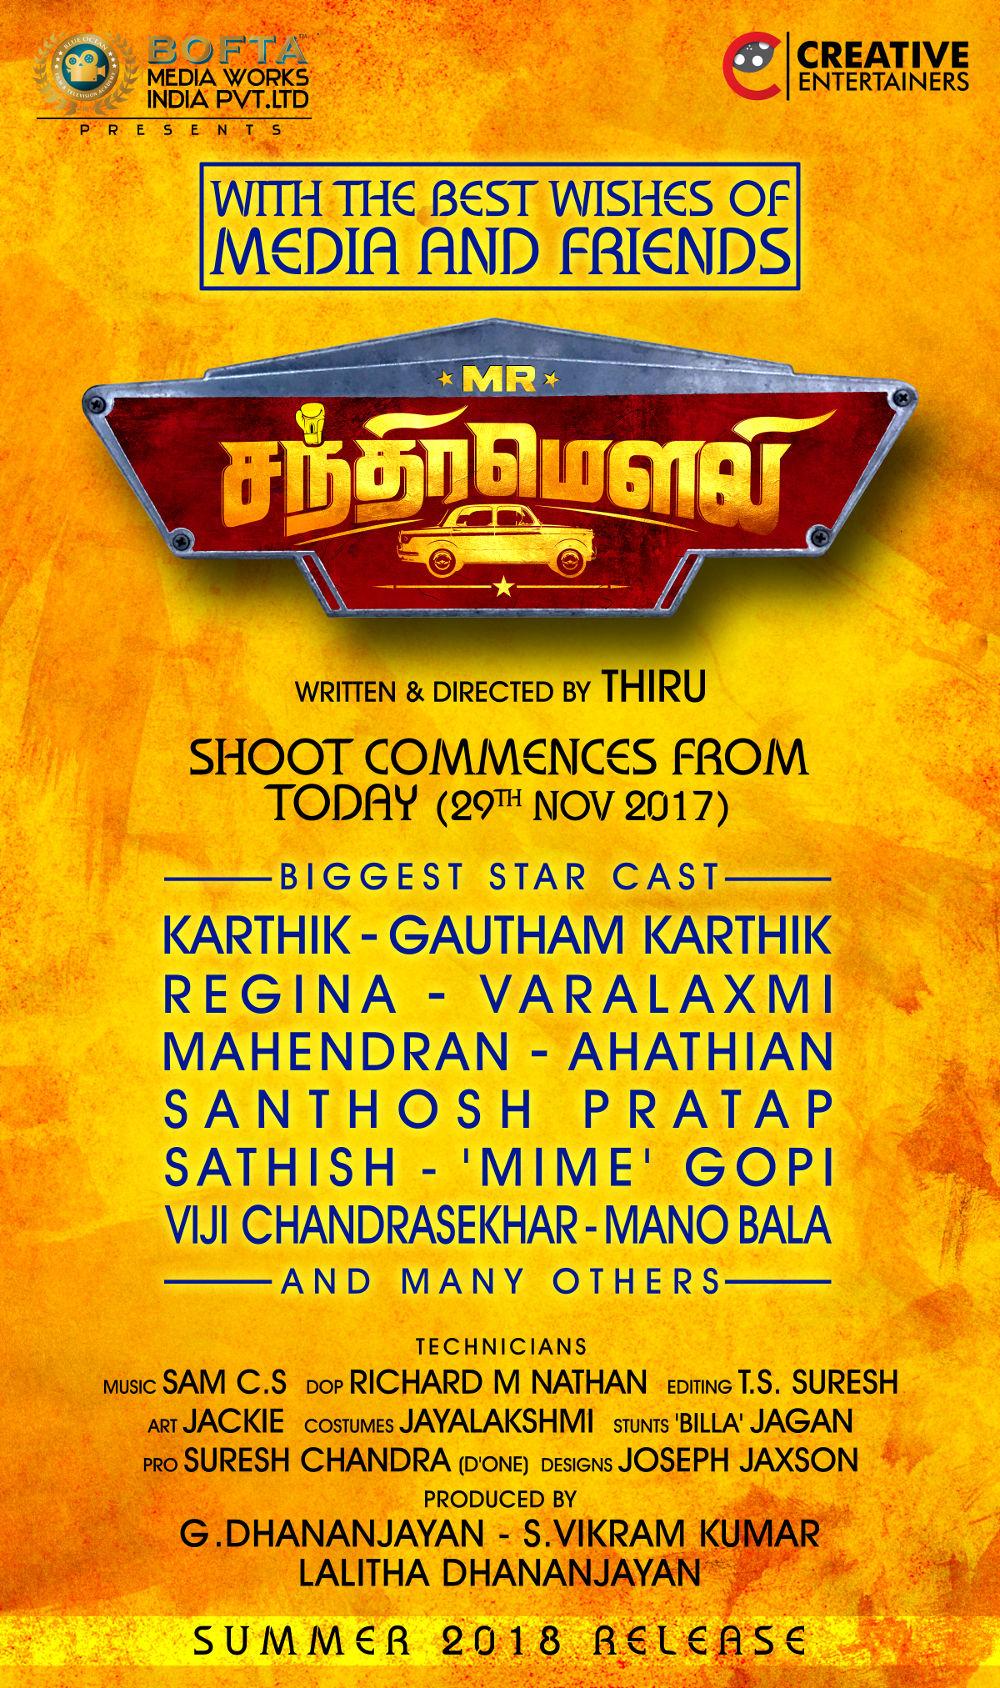 Mr.Chandramouli shoot commences